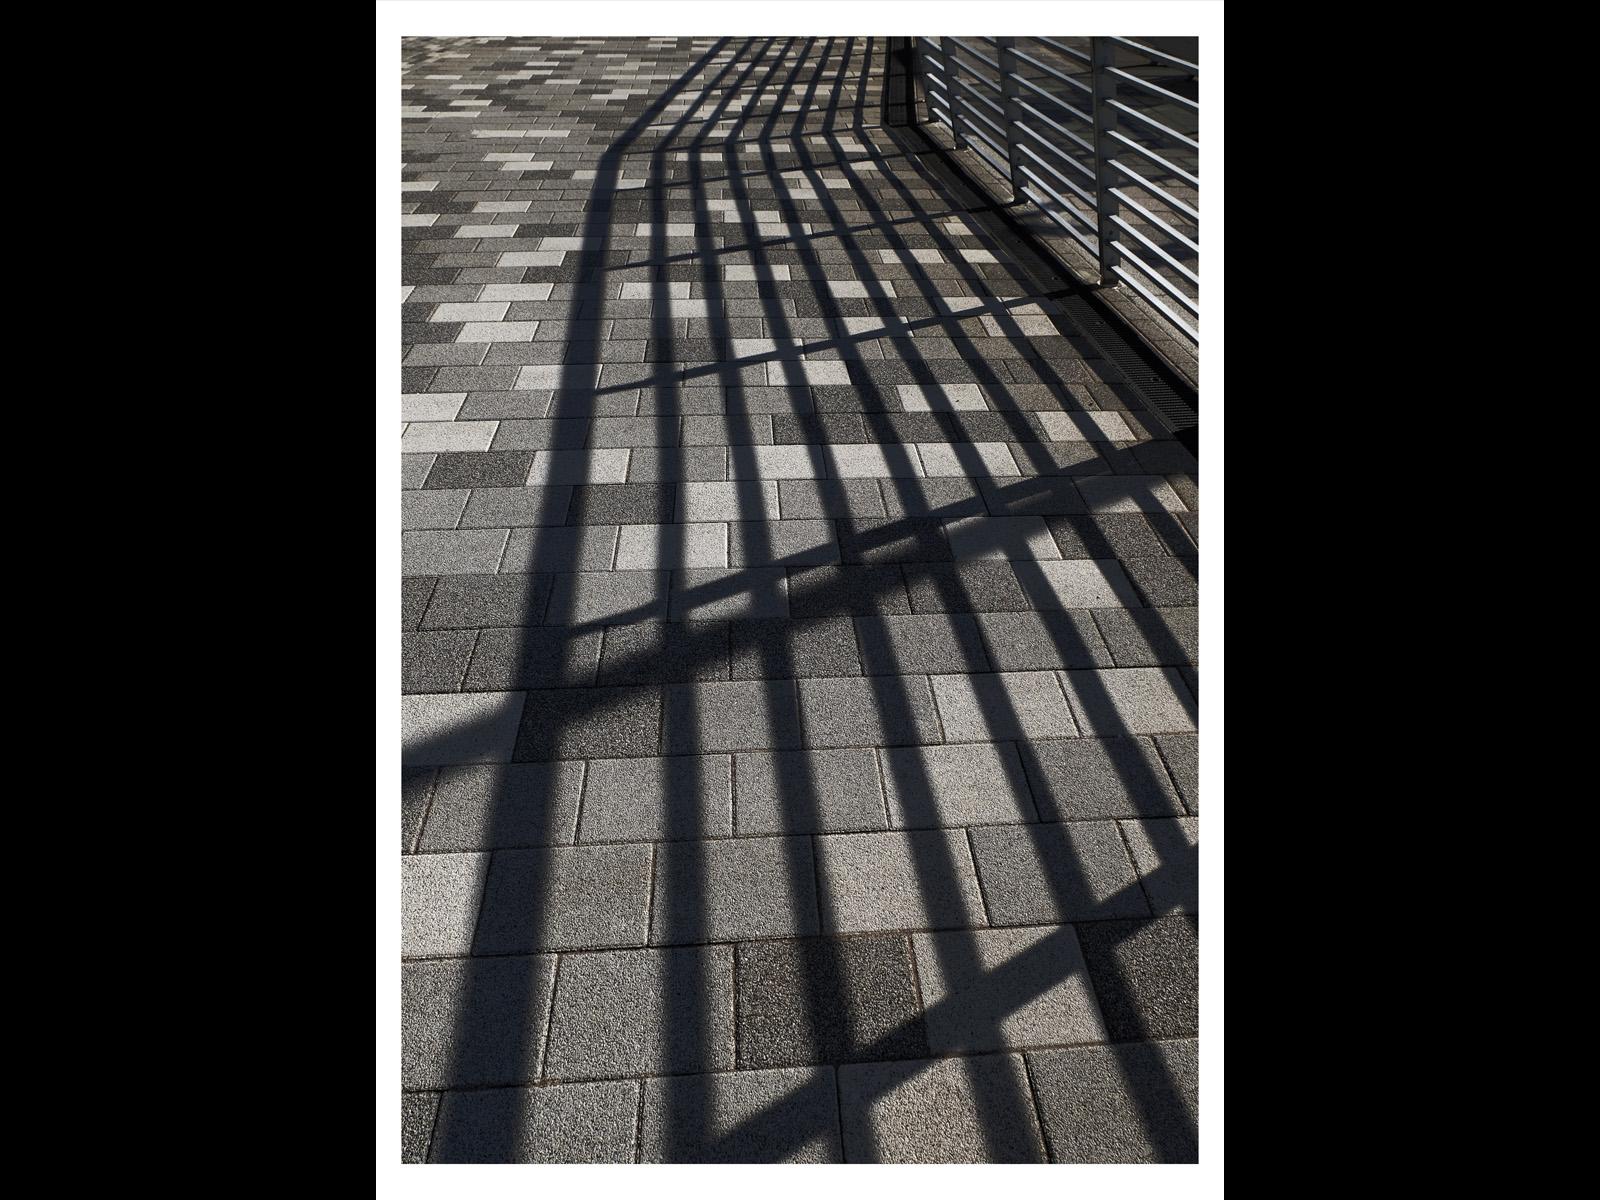 Pavement shadows